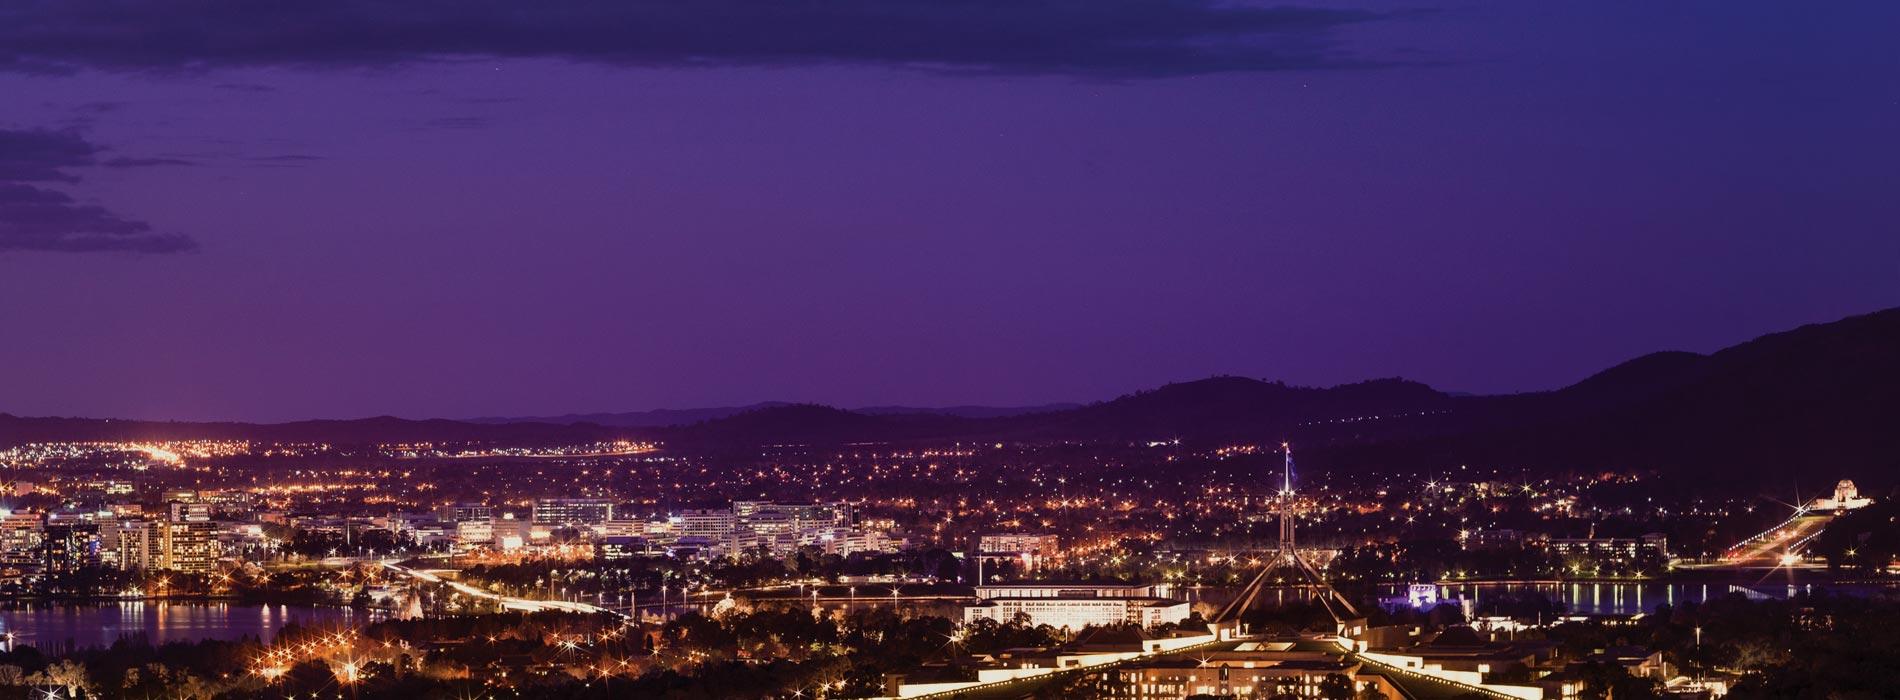 CBR – Brand Canberra banner image